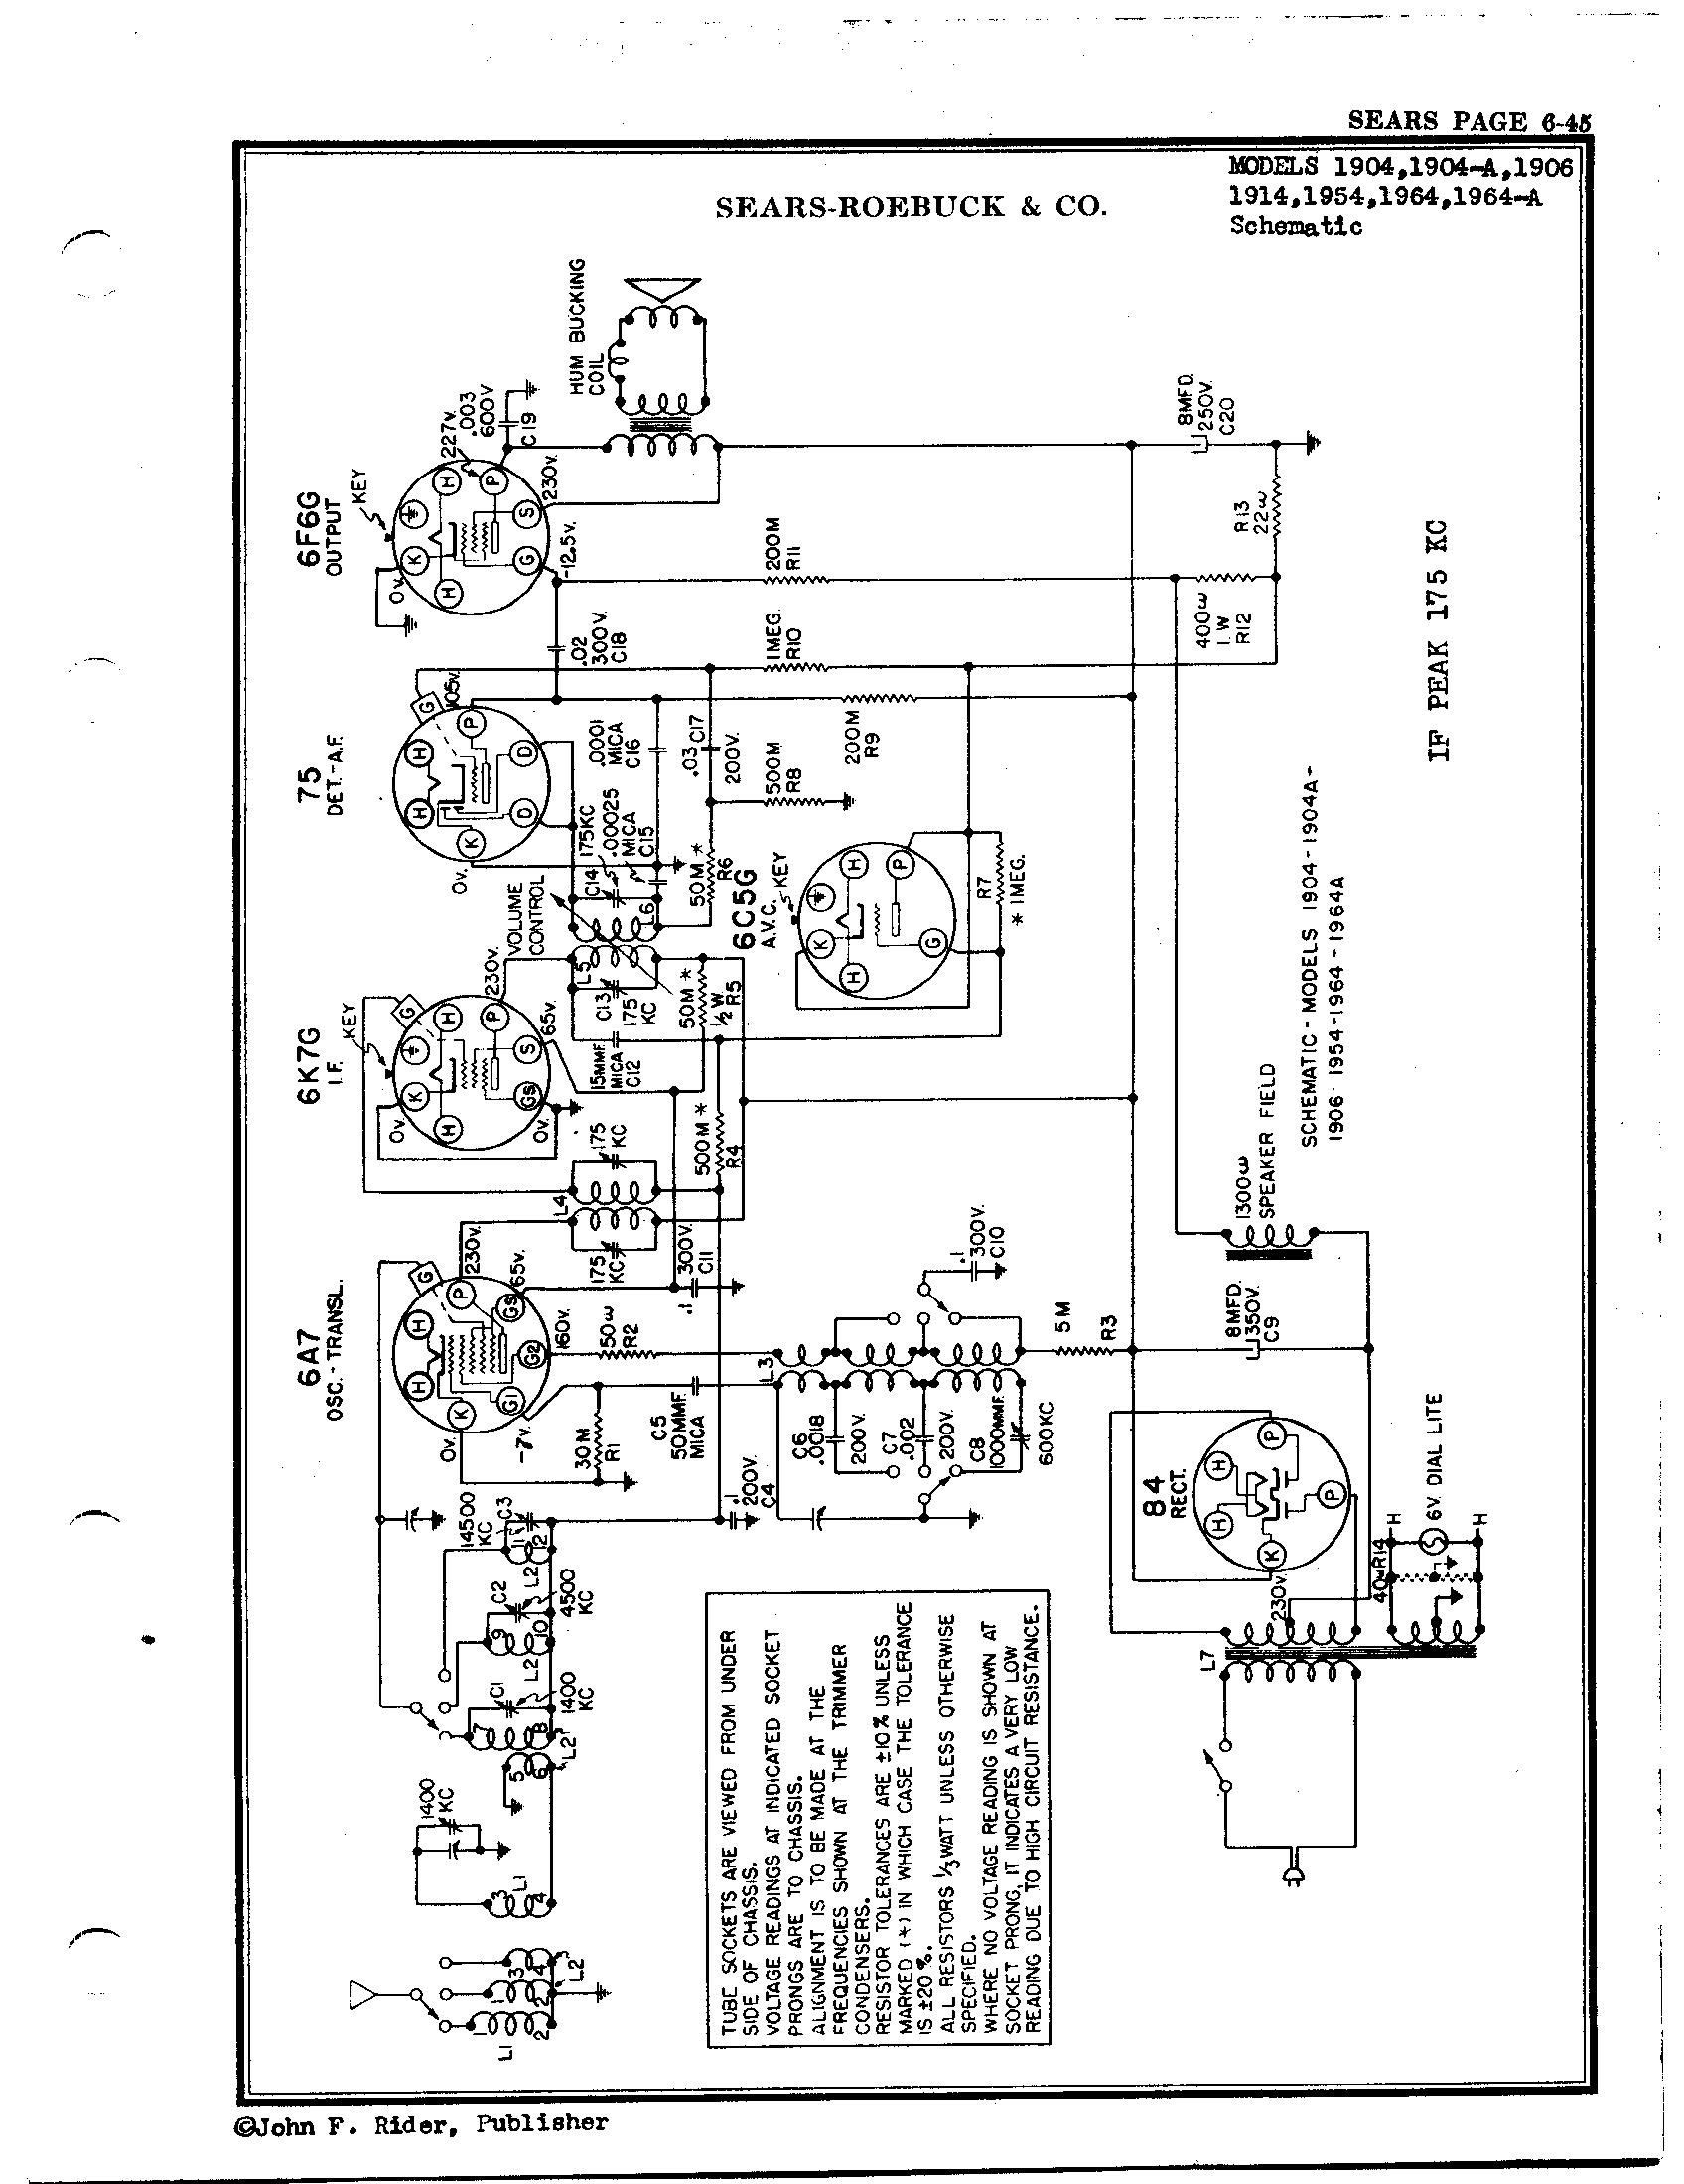 Tl084 Quad Jfet Op   Ic together with Kt88 Tube  lifier Schematics likewise Diy Guitar Tube   Schematics also 1954 likewise Lm386n 1 325mwatt Audio  lifier. on amplifier kits guitar